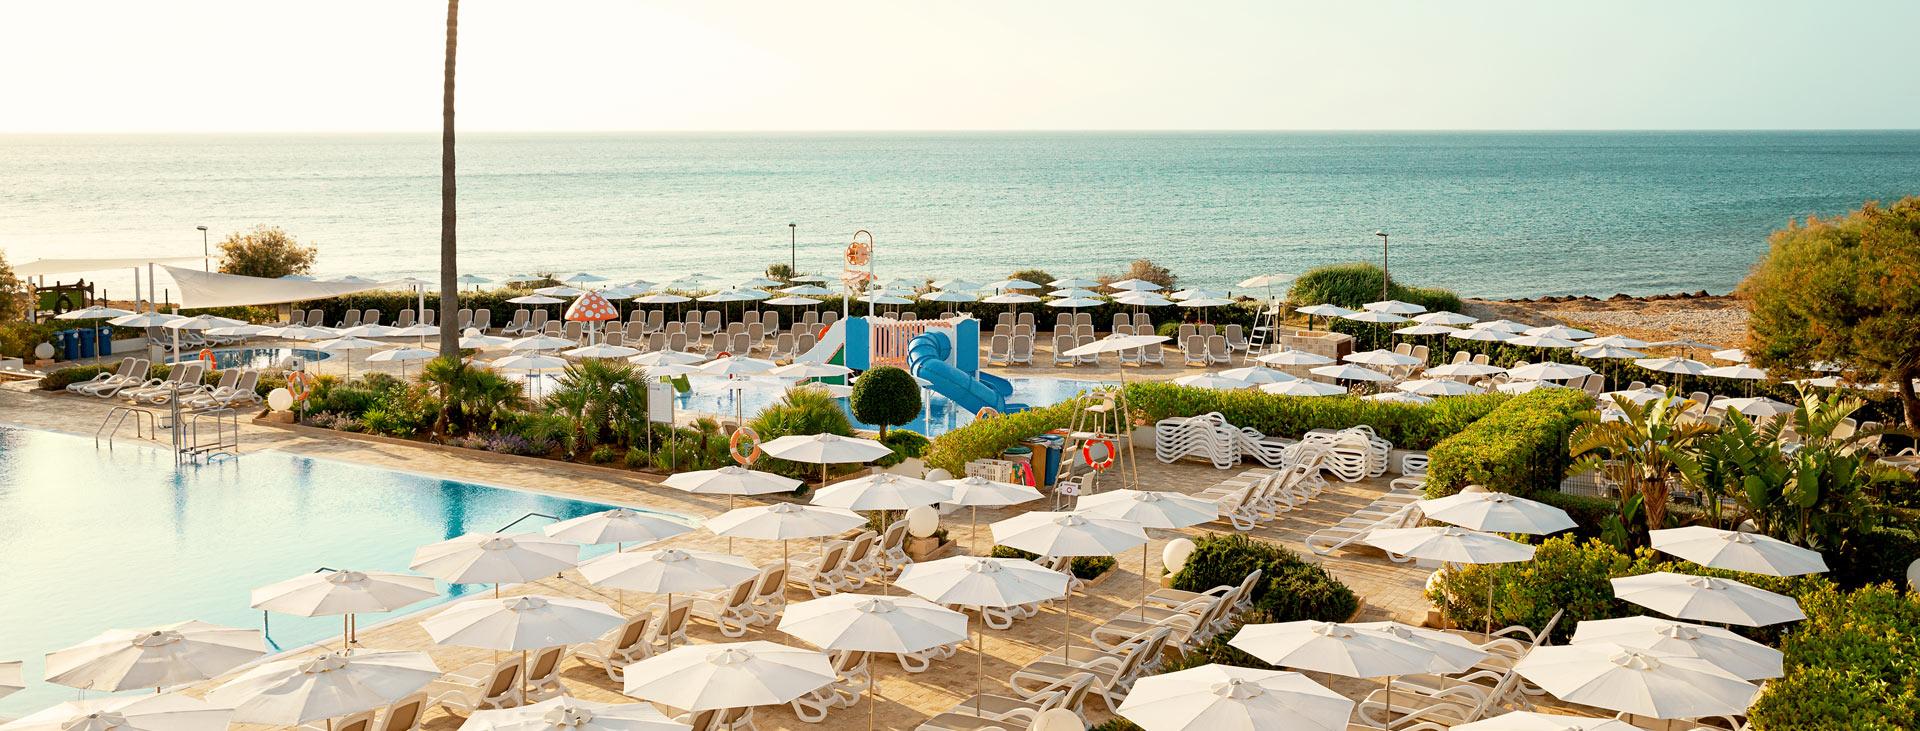 Sunwing Cala Bona Beach, Cala Bona, Mallorca, Spanien